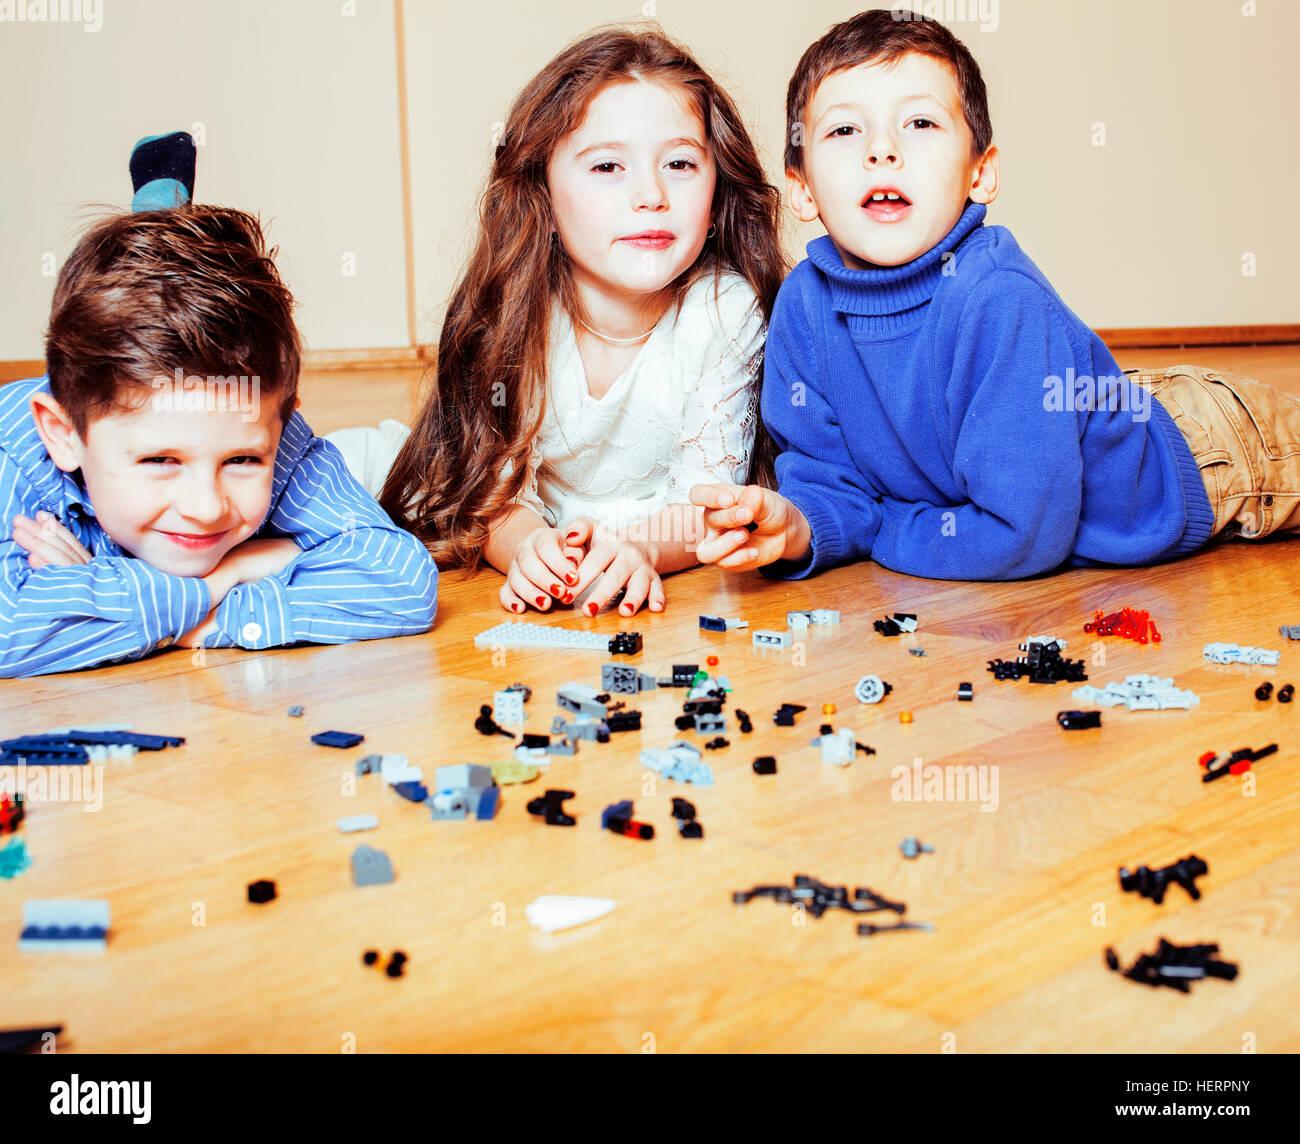 Child Lego Stockfotos & Child Lego Bilder Seite 10 Alamy